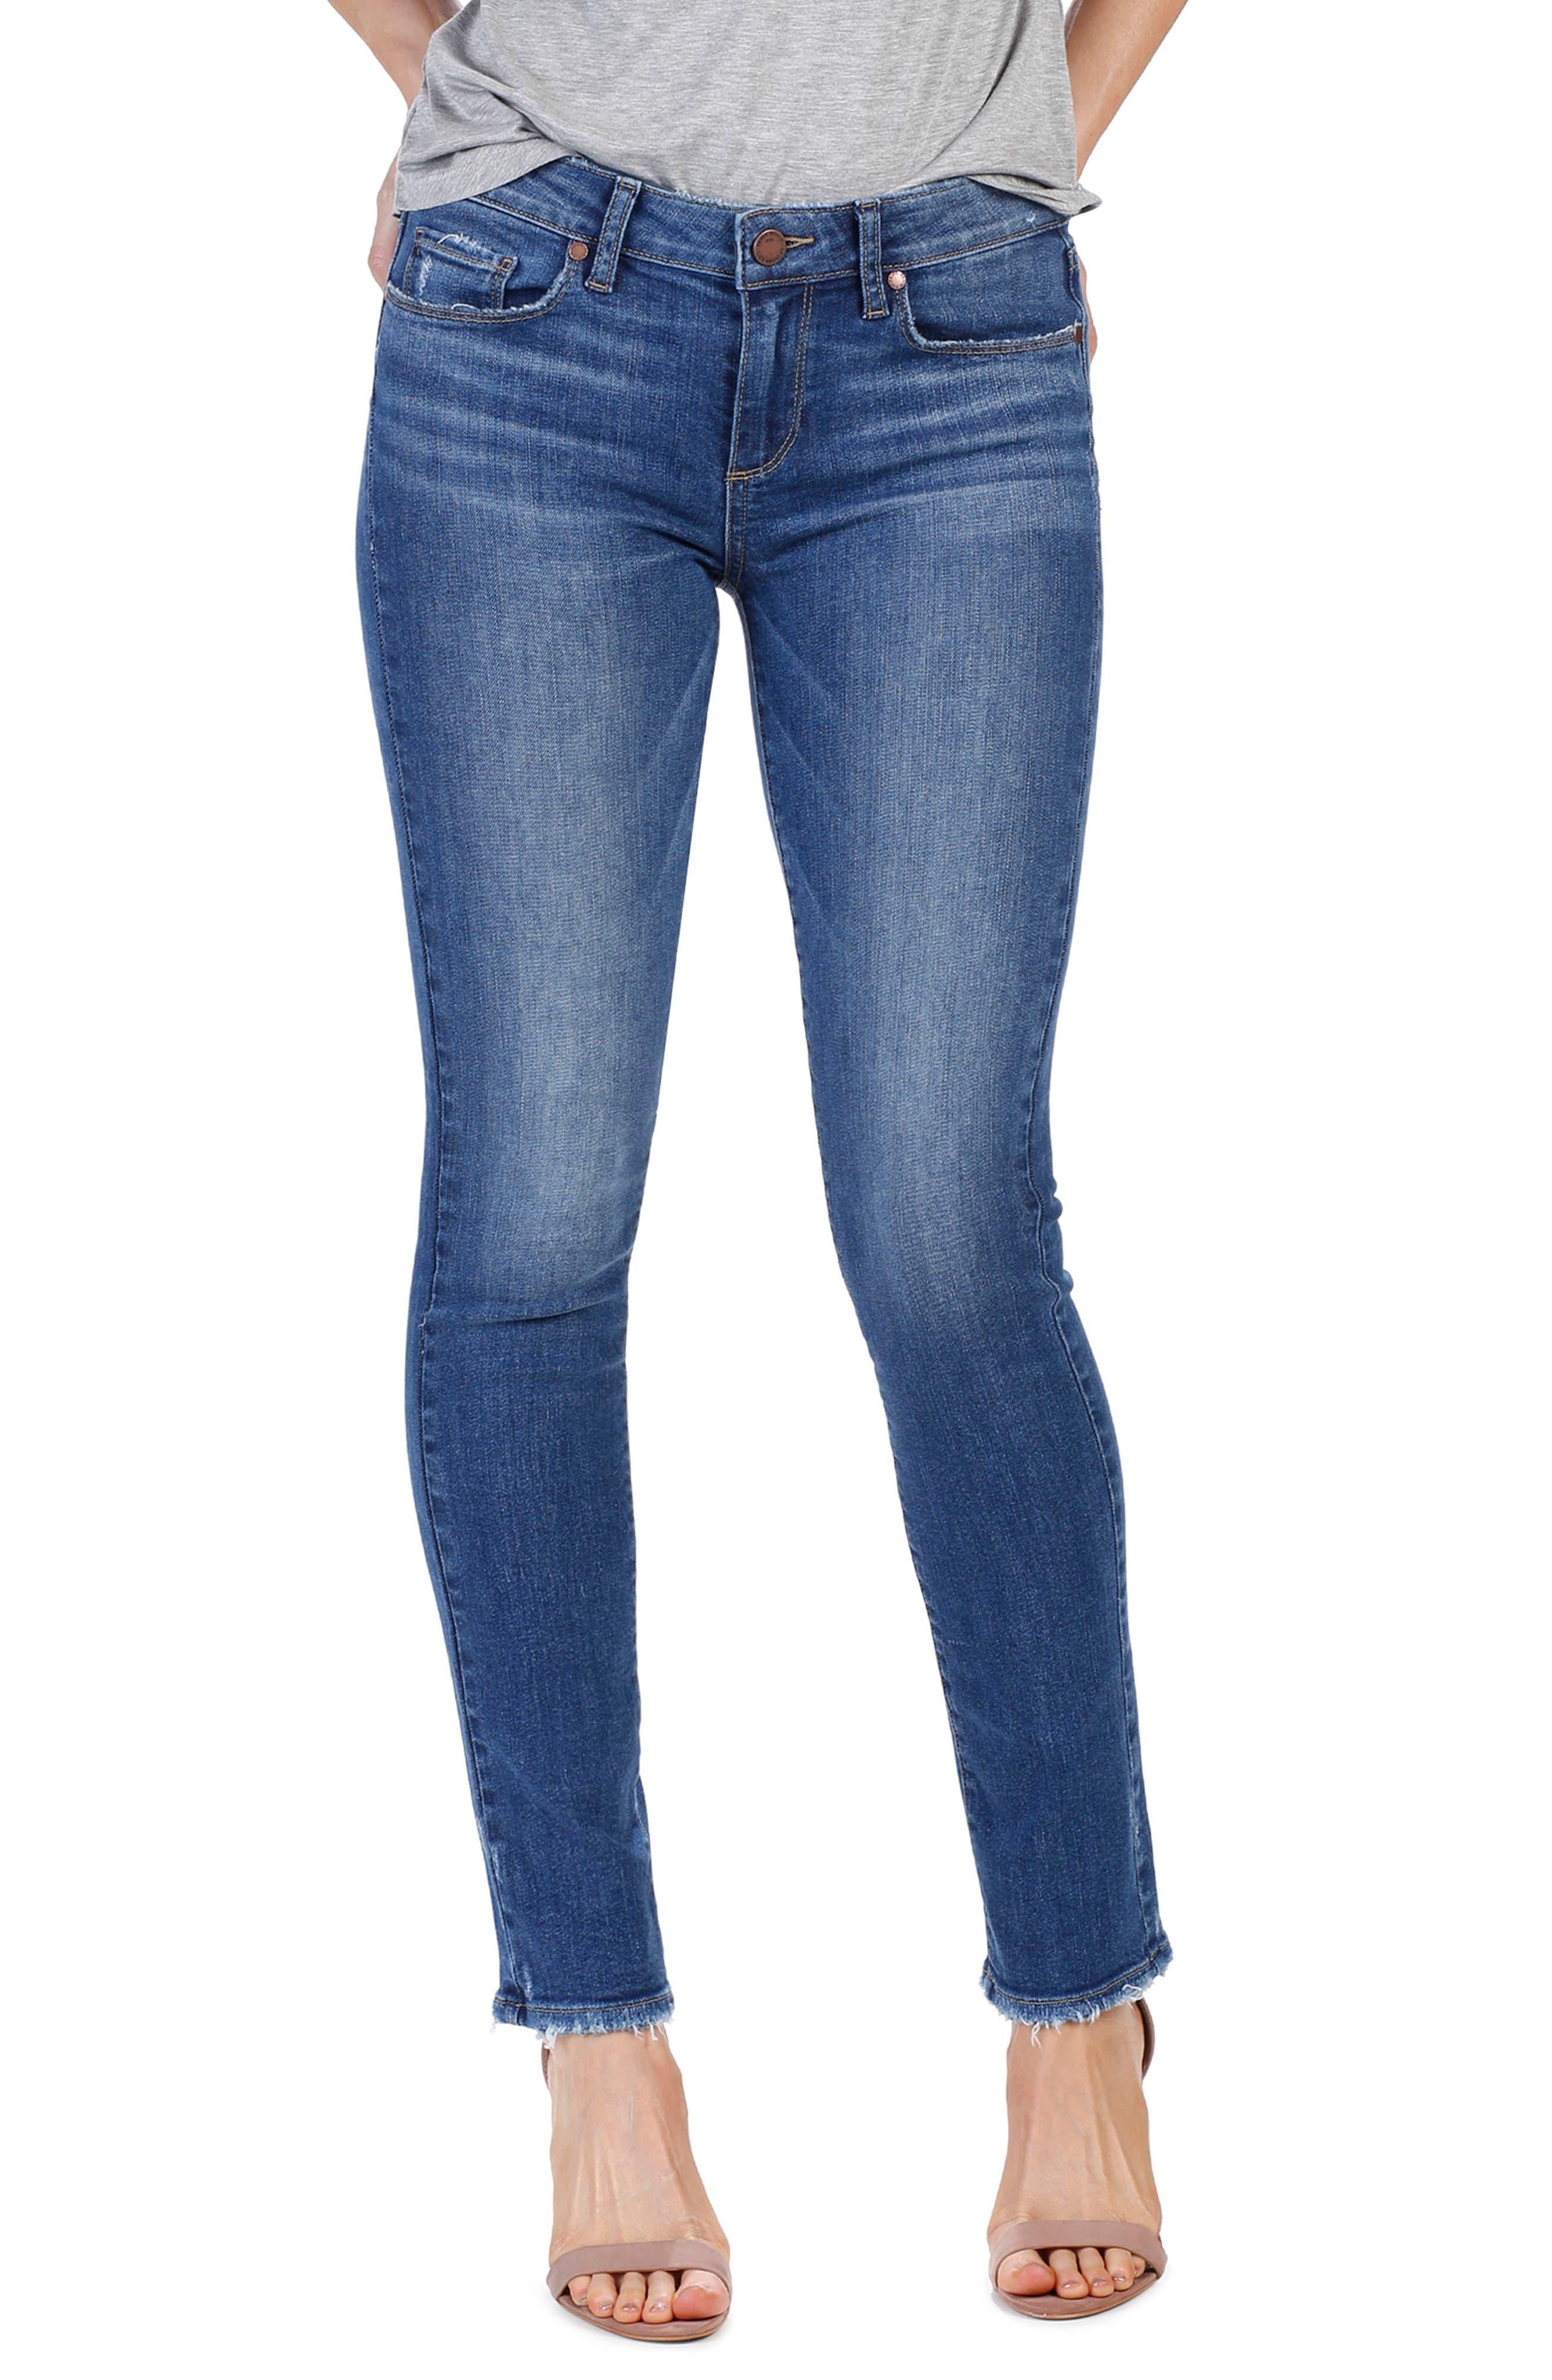 Skyline Skinny Jeans,                         Main,                         color, Bali